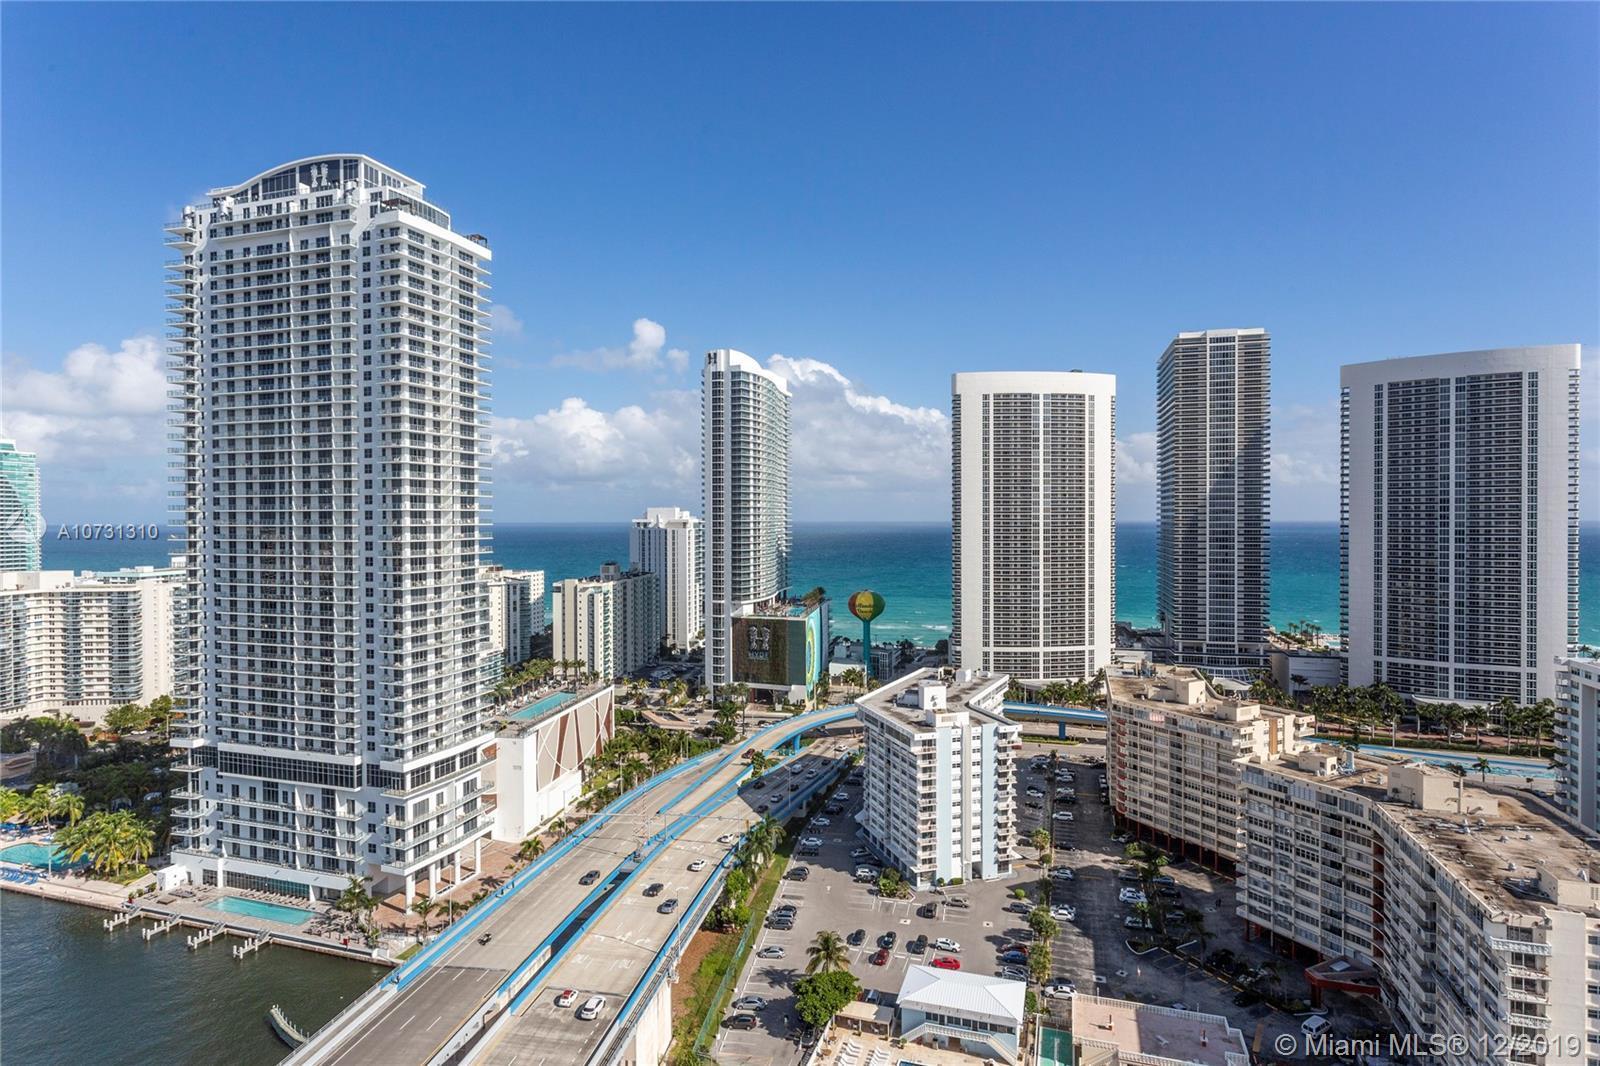 PRICED TO SELL! Beautiful Hallandale Beach. Beachwalk Condominium, Fabulously designed modern 3/3, c